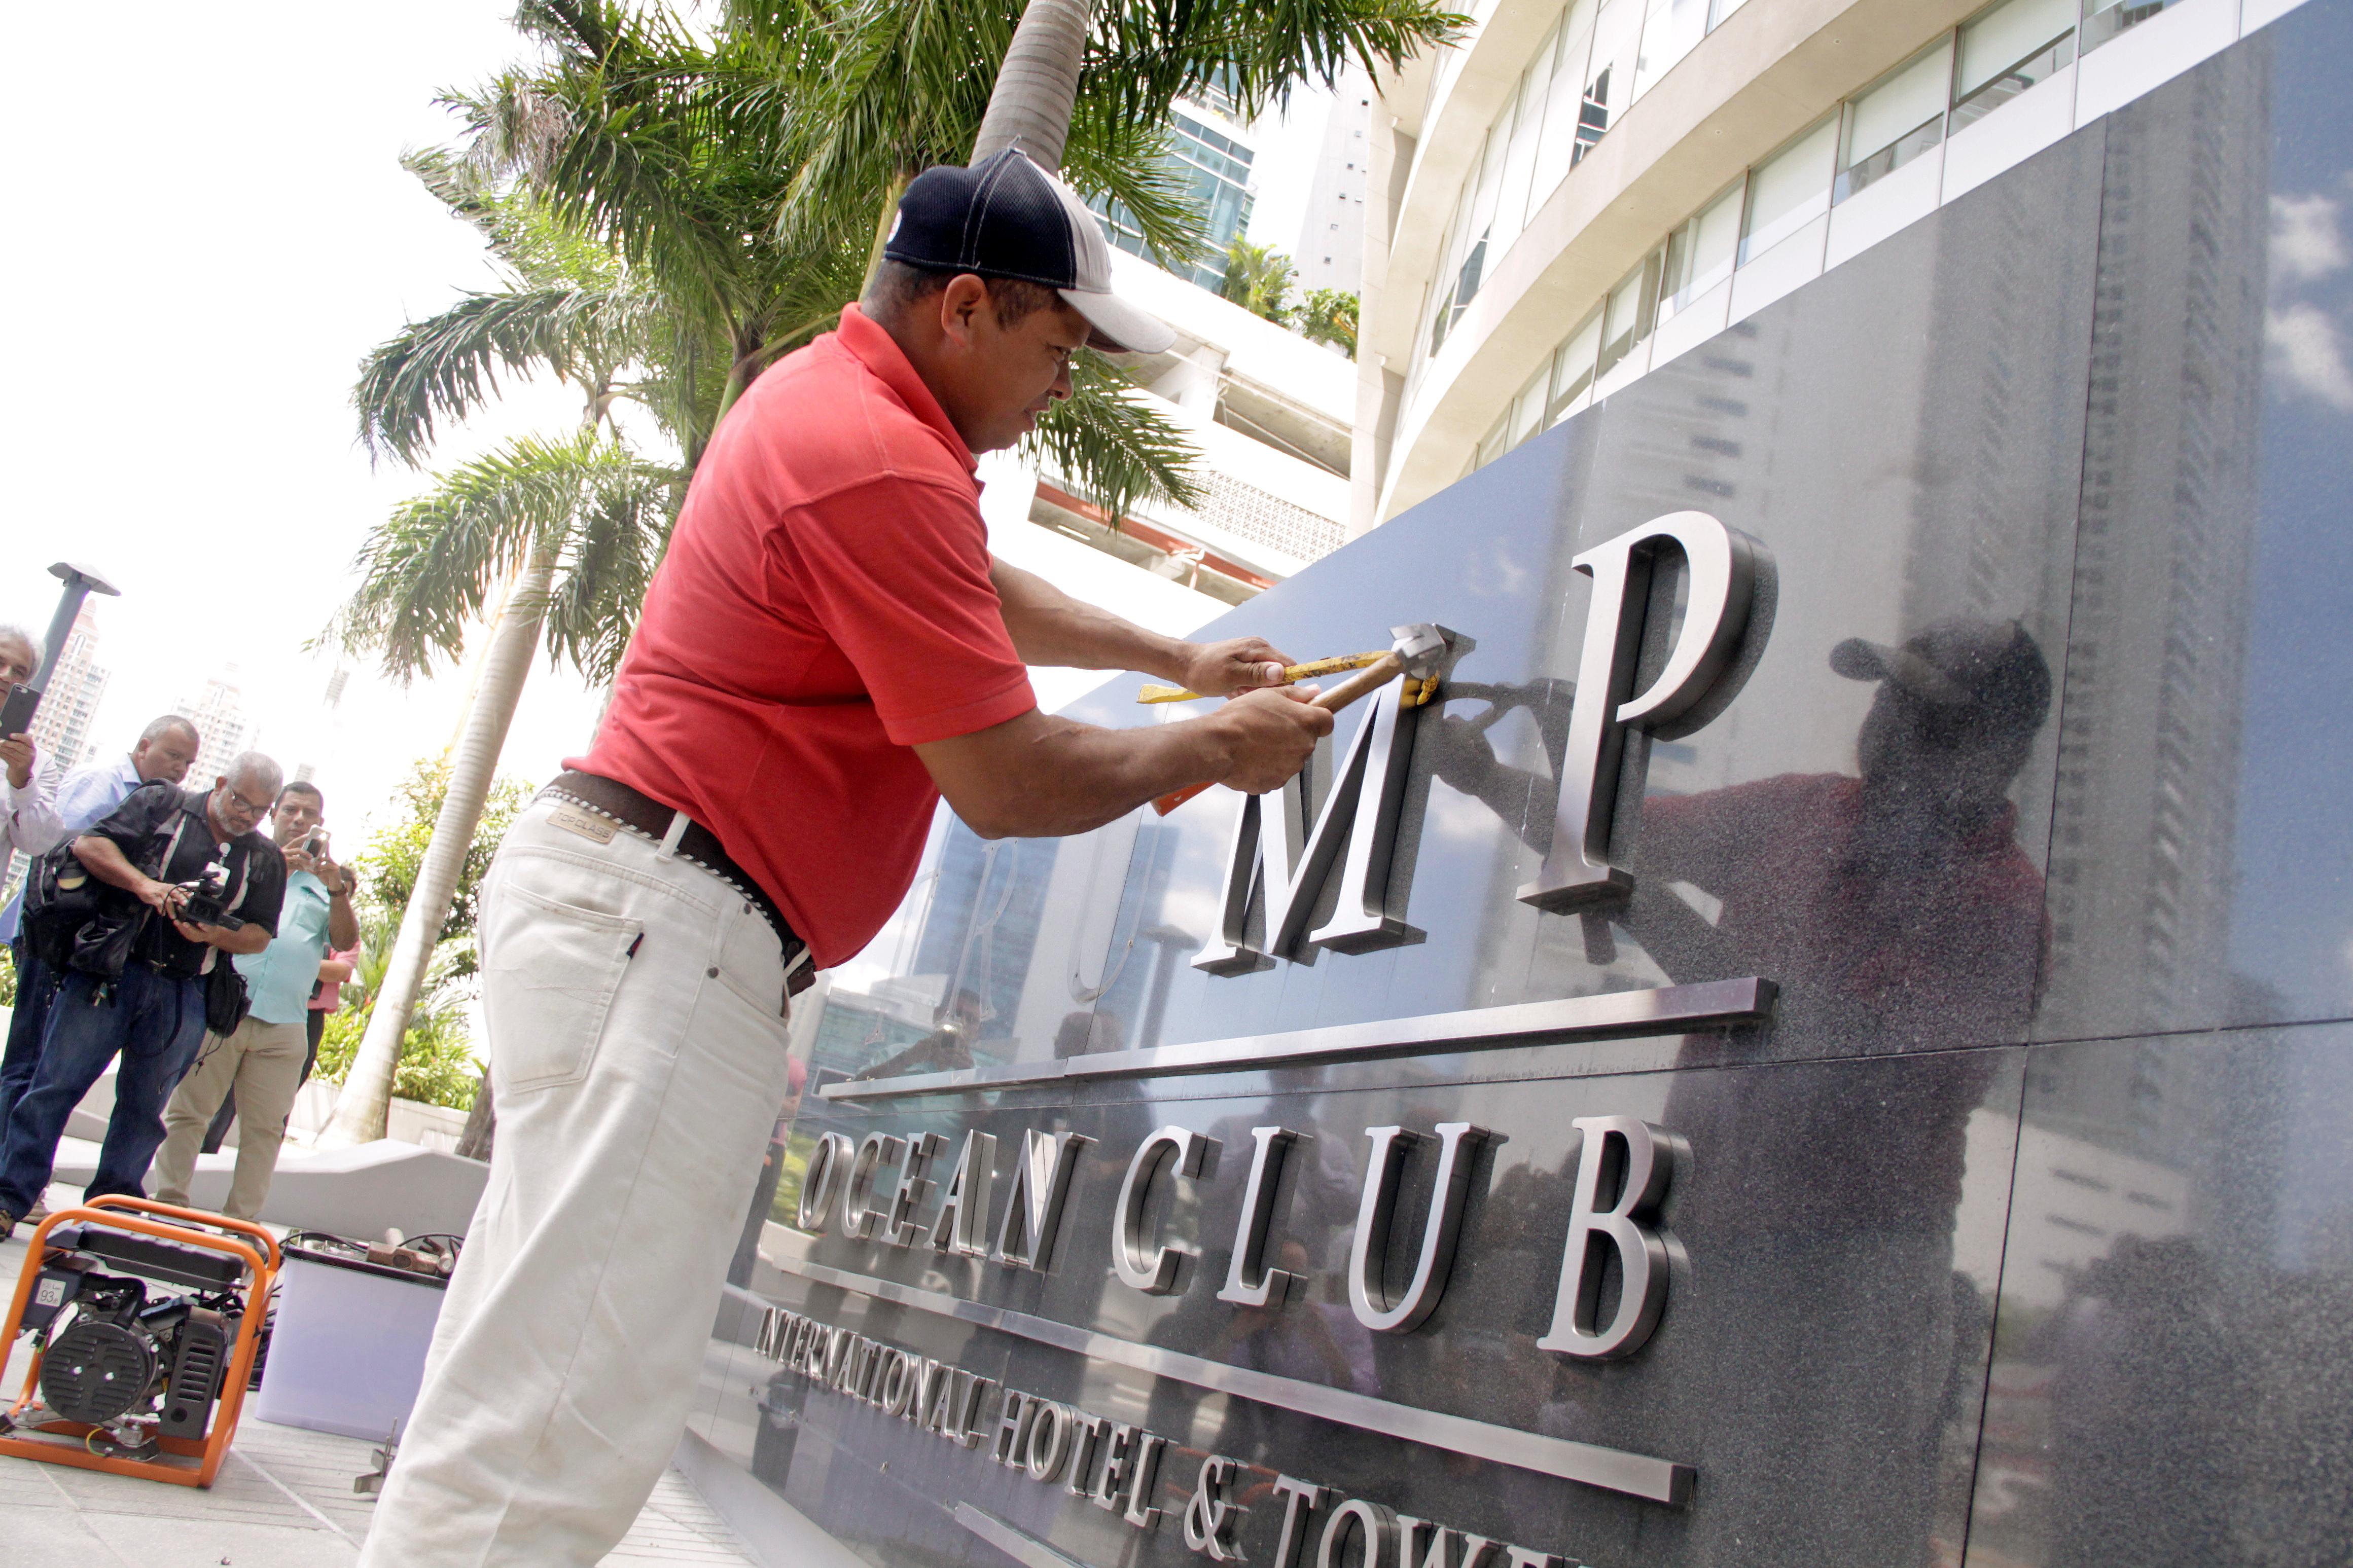 Organización Trump pide a Panamá aclarar disputa inmobiliaria